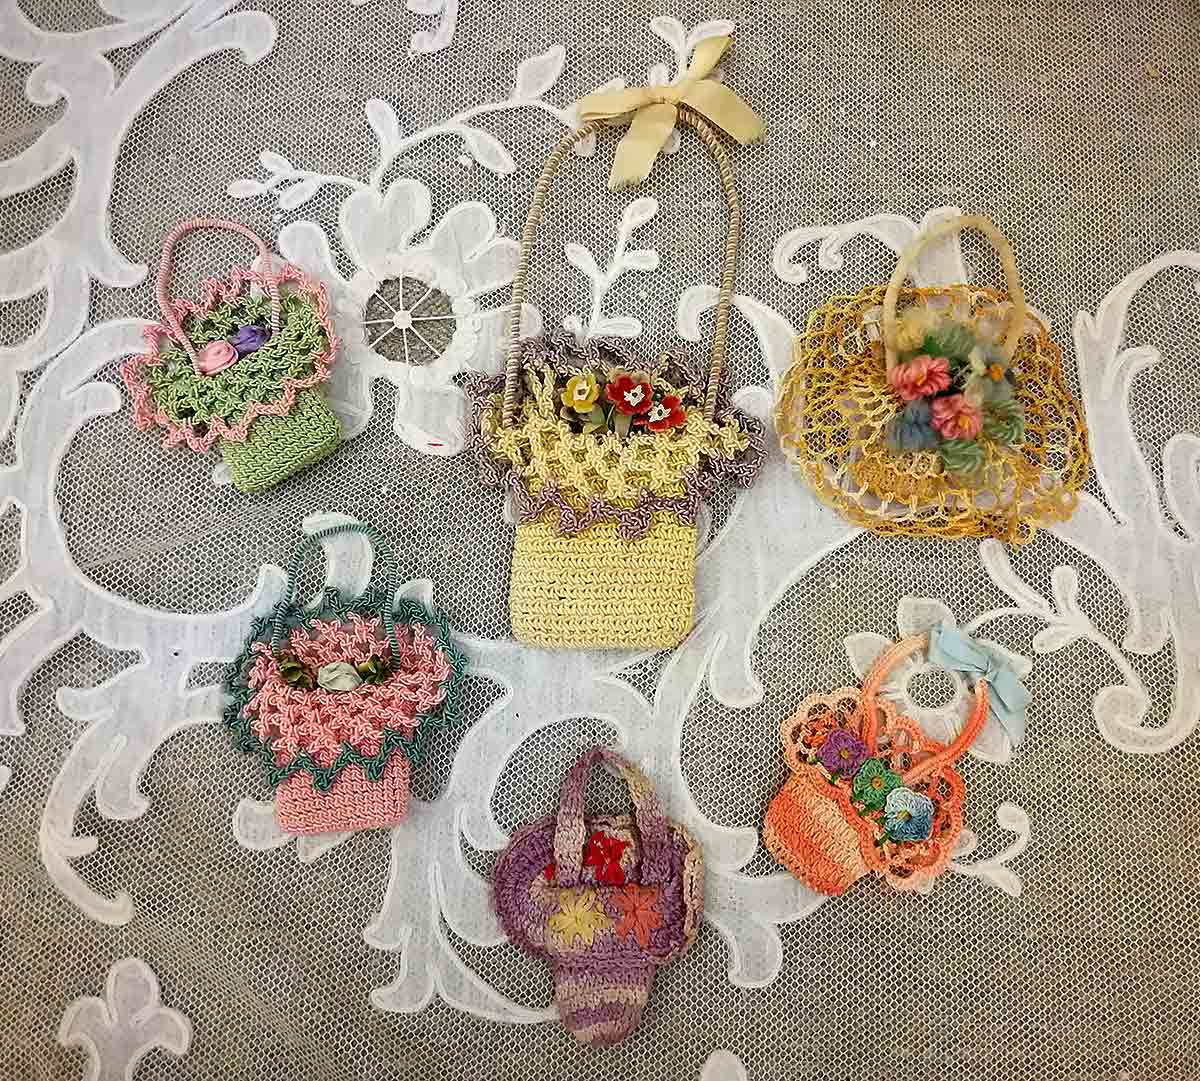 Antique crochet baskets